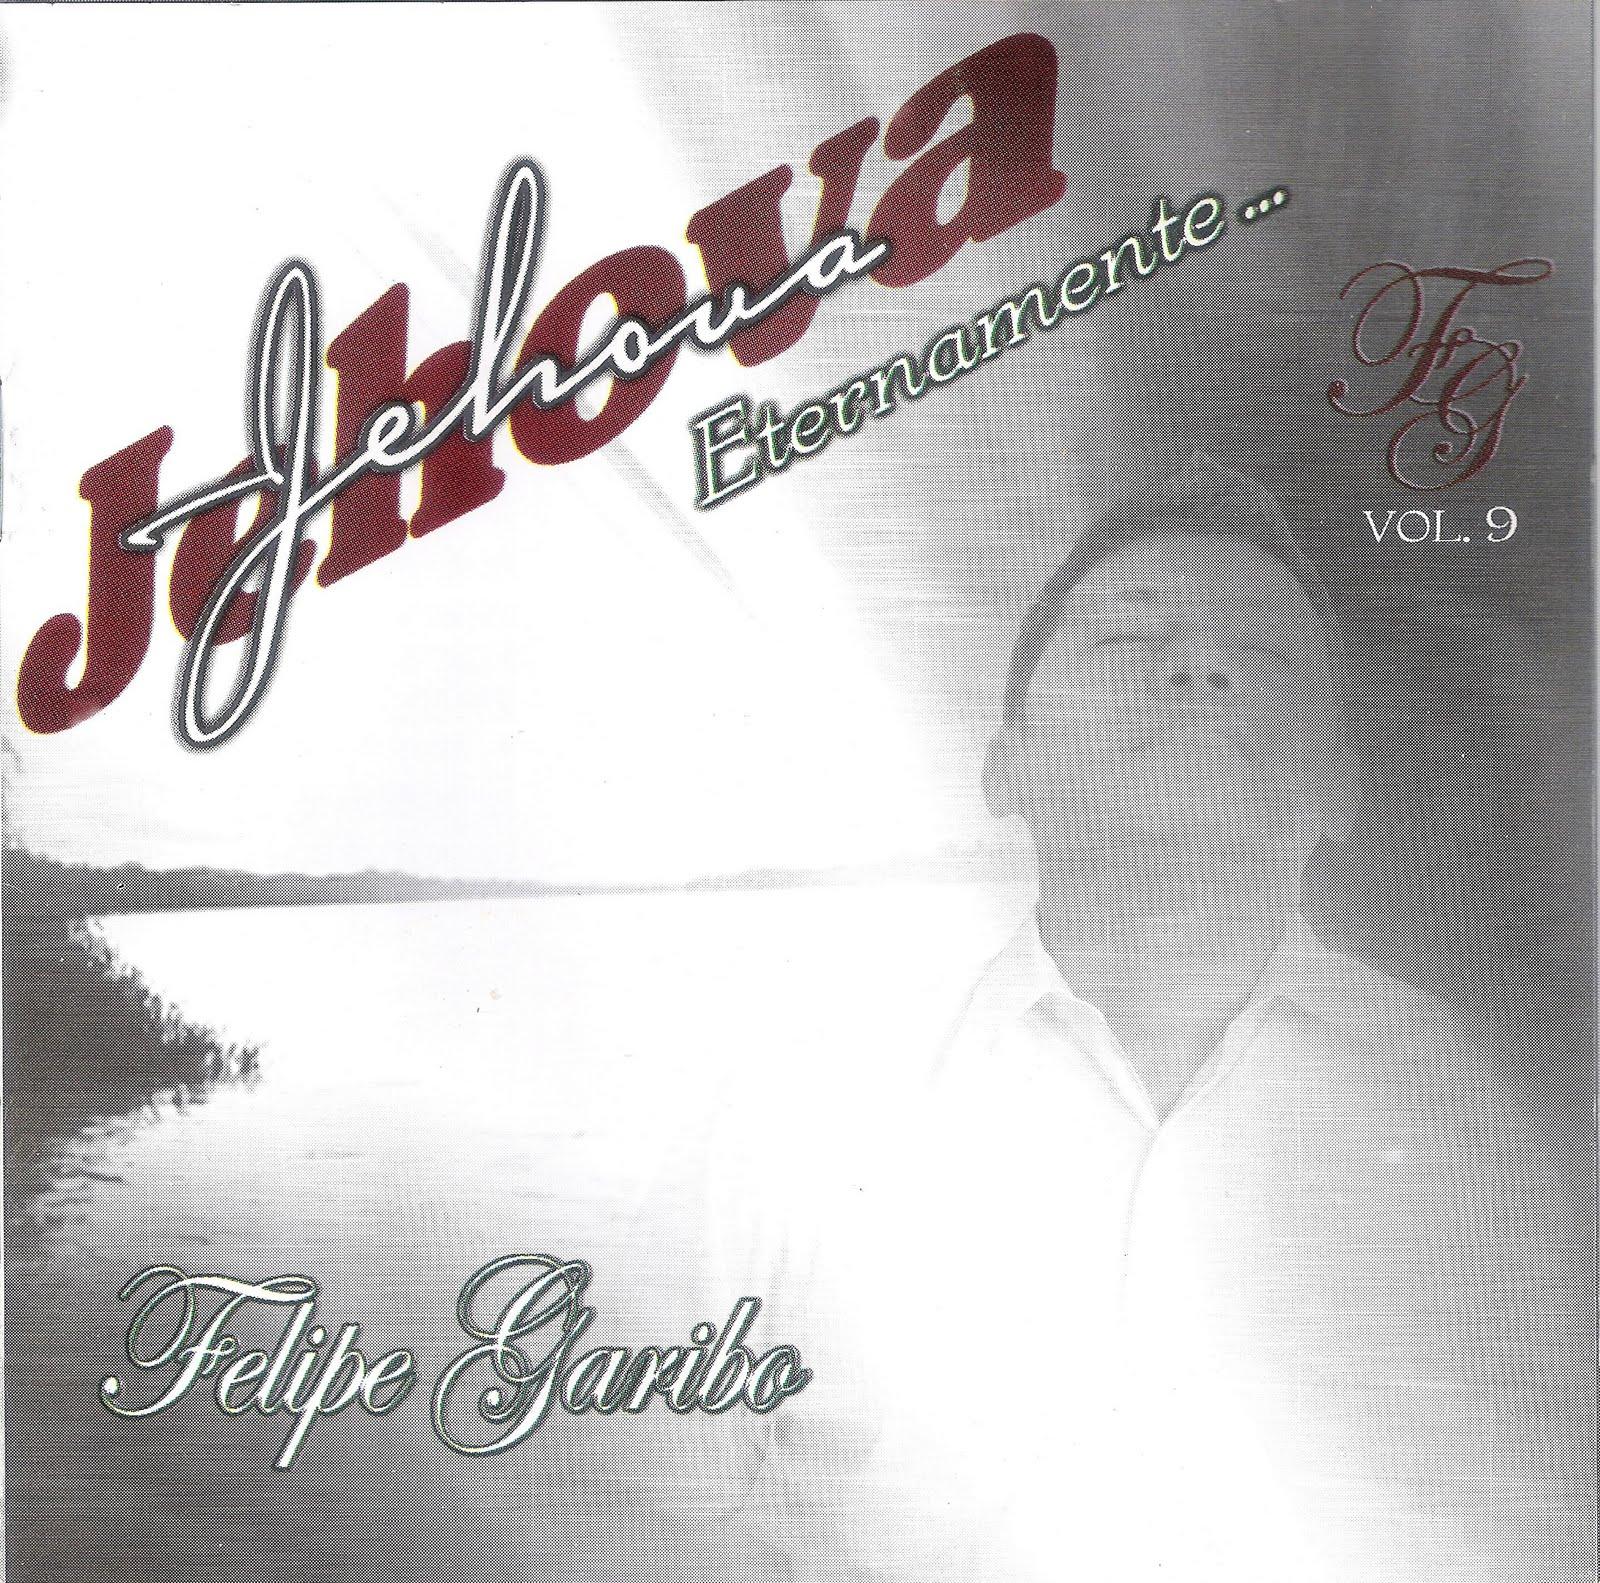 Mi Musik y + ♫☼♀♪: Felipe Garibo Vol 9.. NEW Felipe Garibo